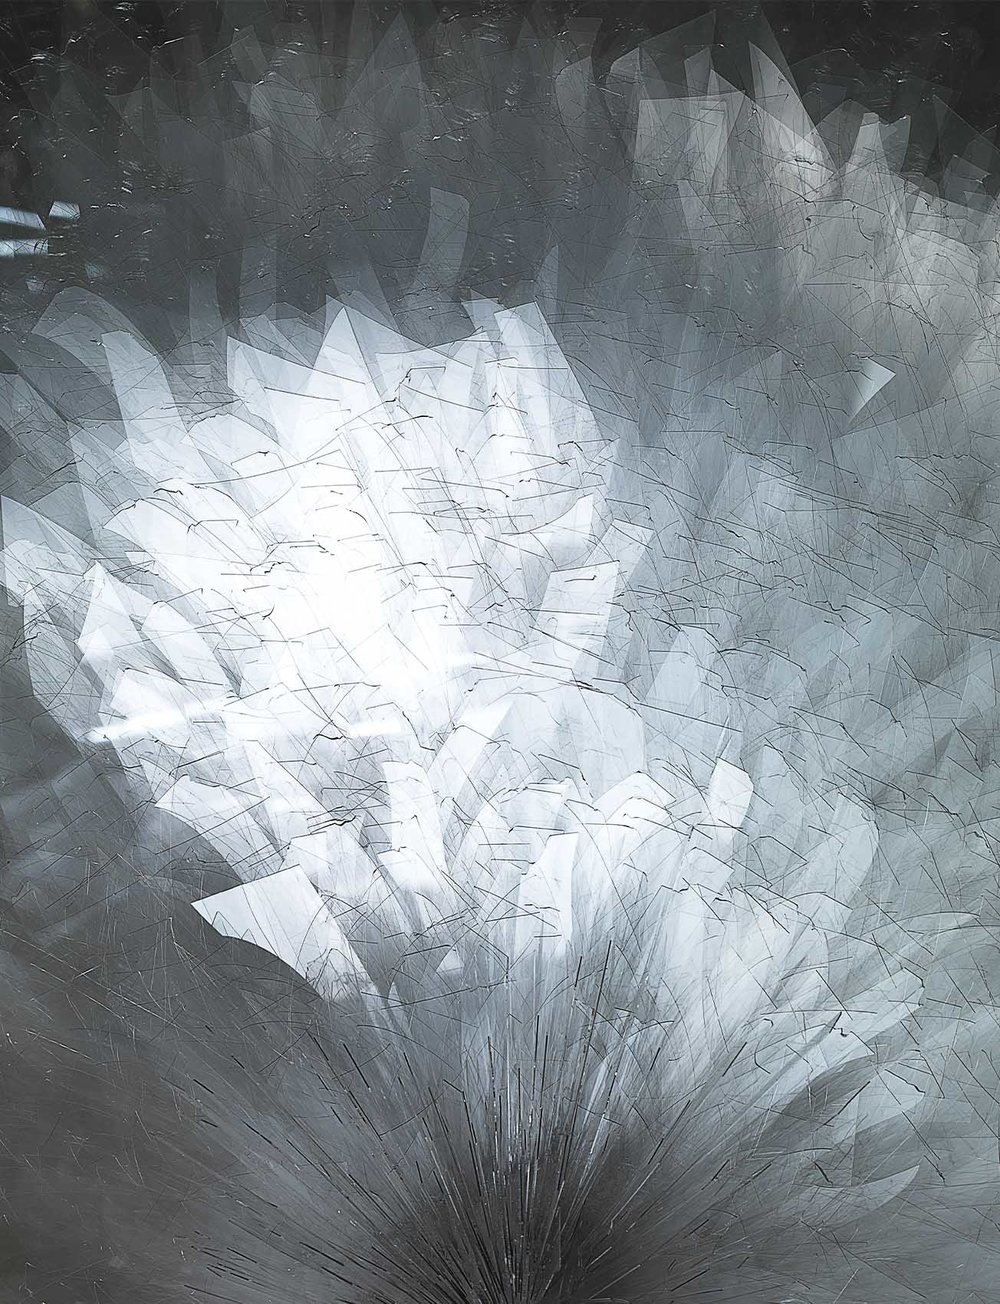 objects-of-desire-1-marblemagazine.jpg